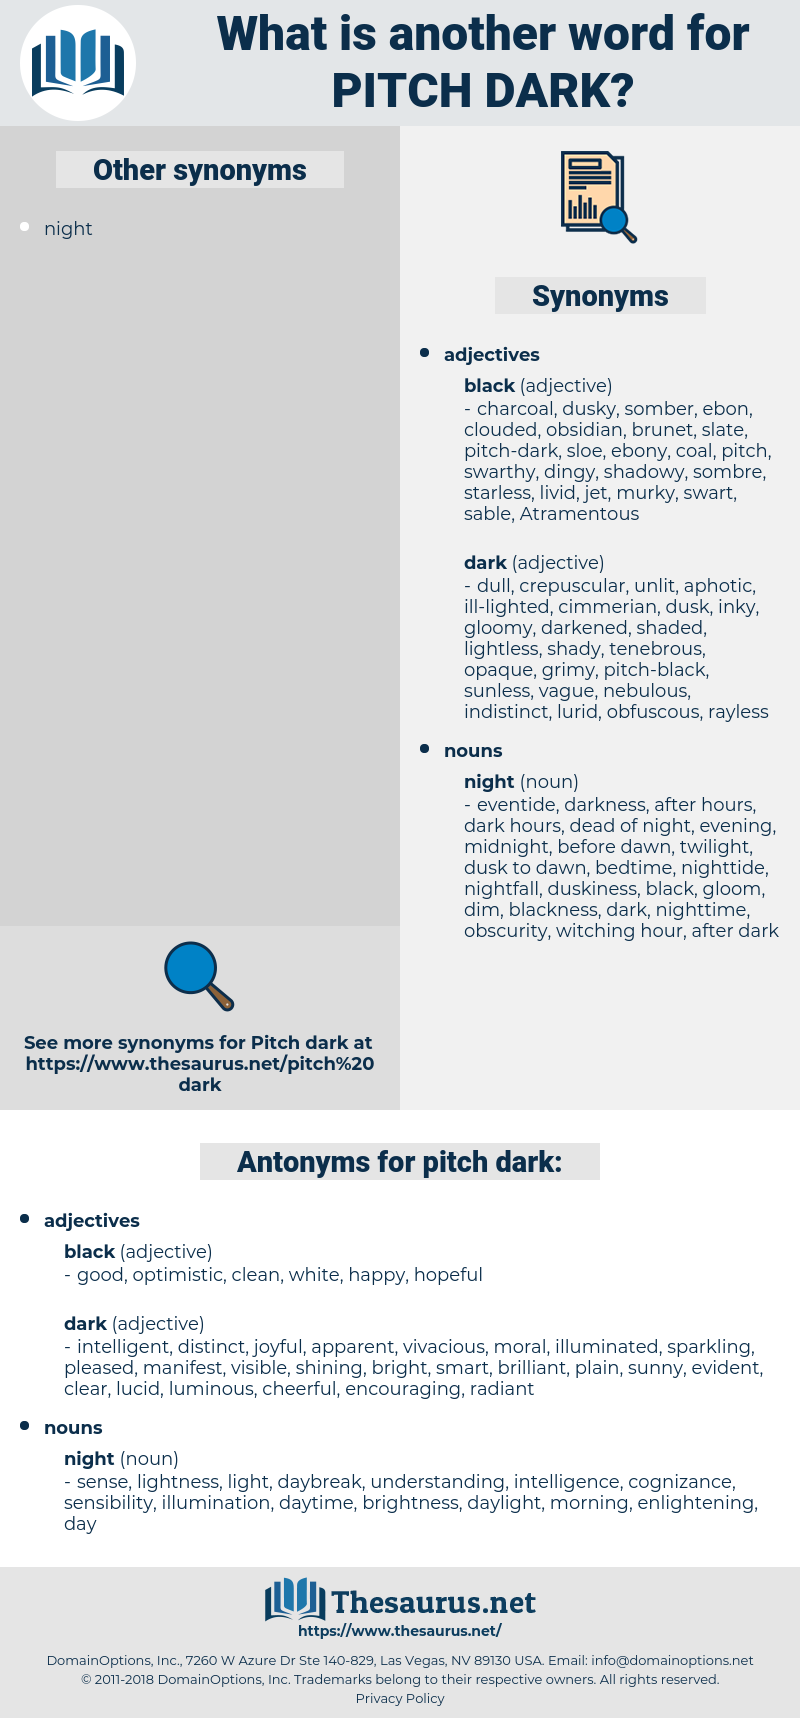 pitch-dark, synonym pitch-dark, another word for pitch-dark, words like pitch-dark, thesaurus pitch-dark